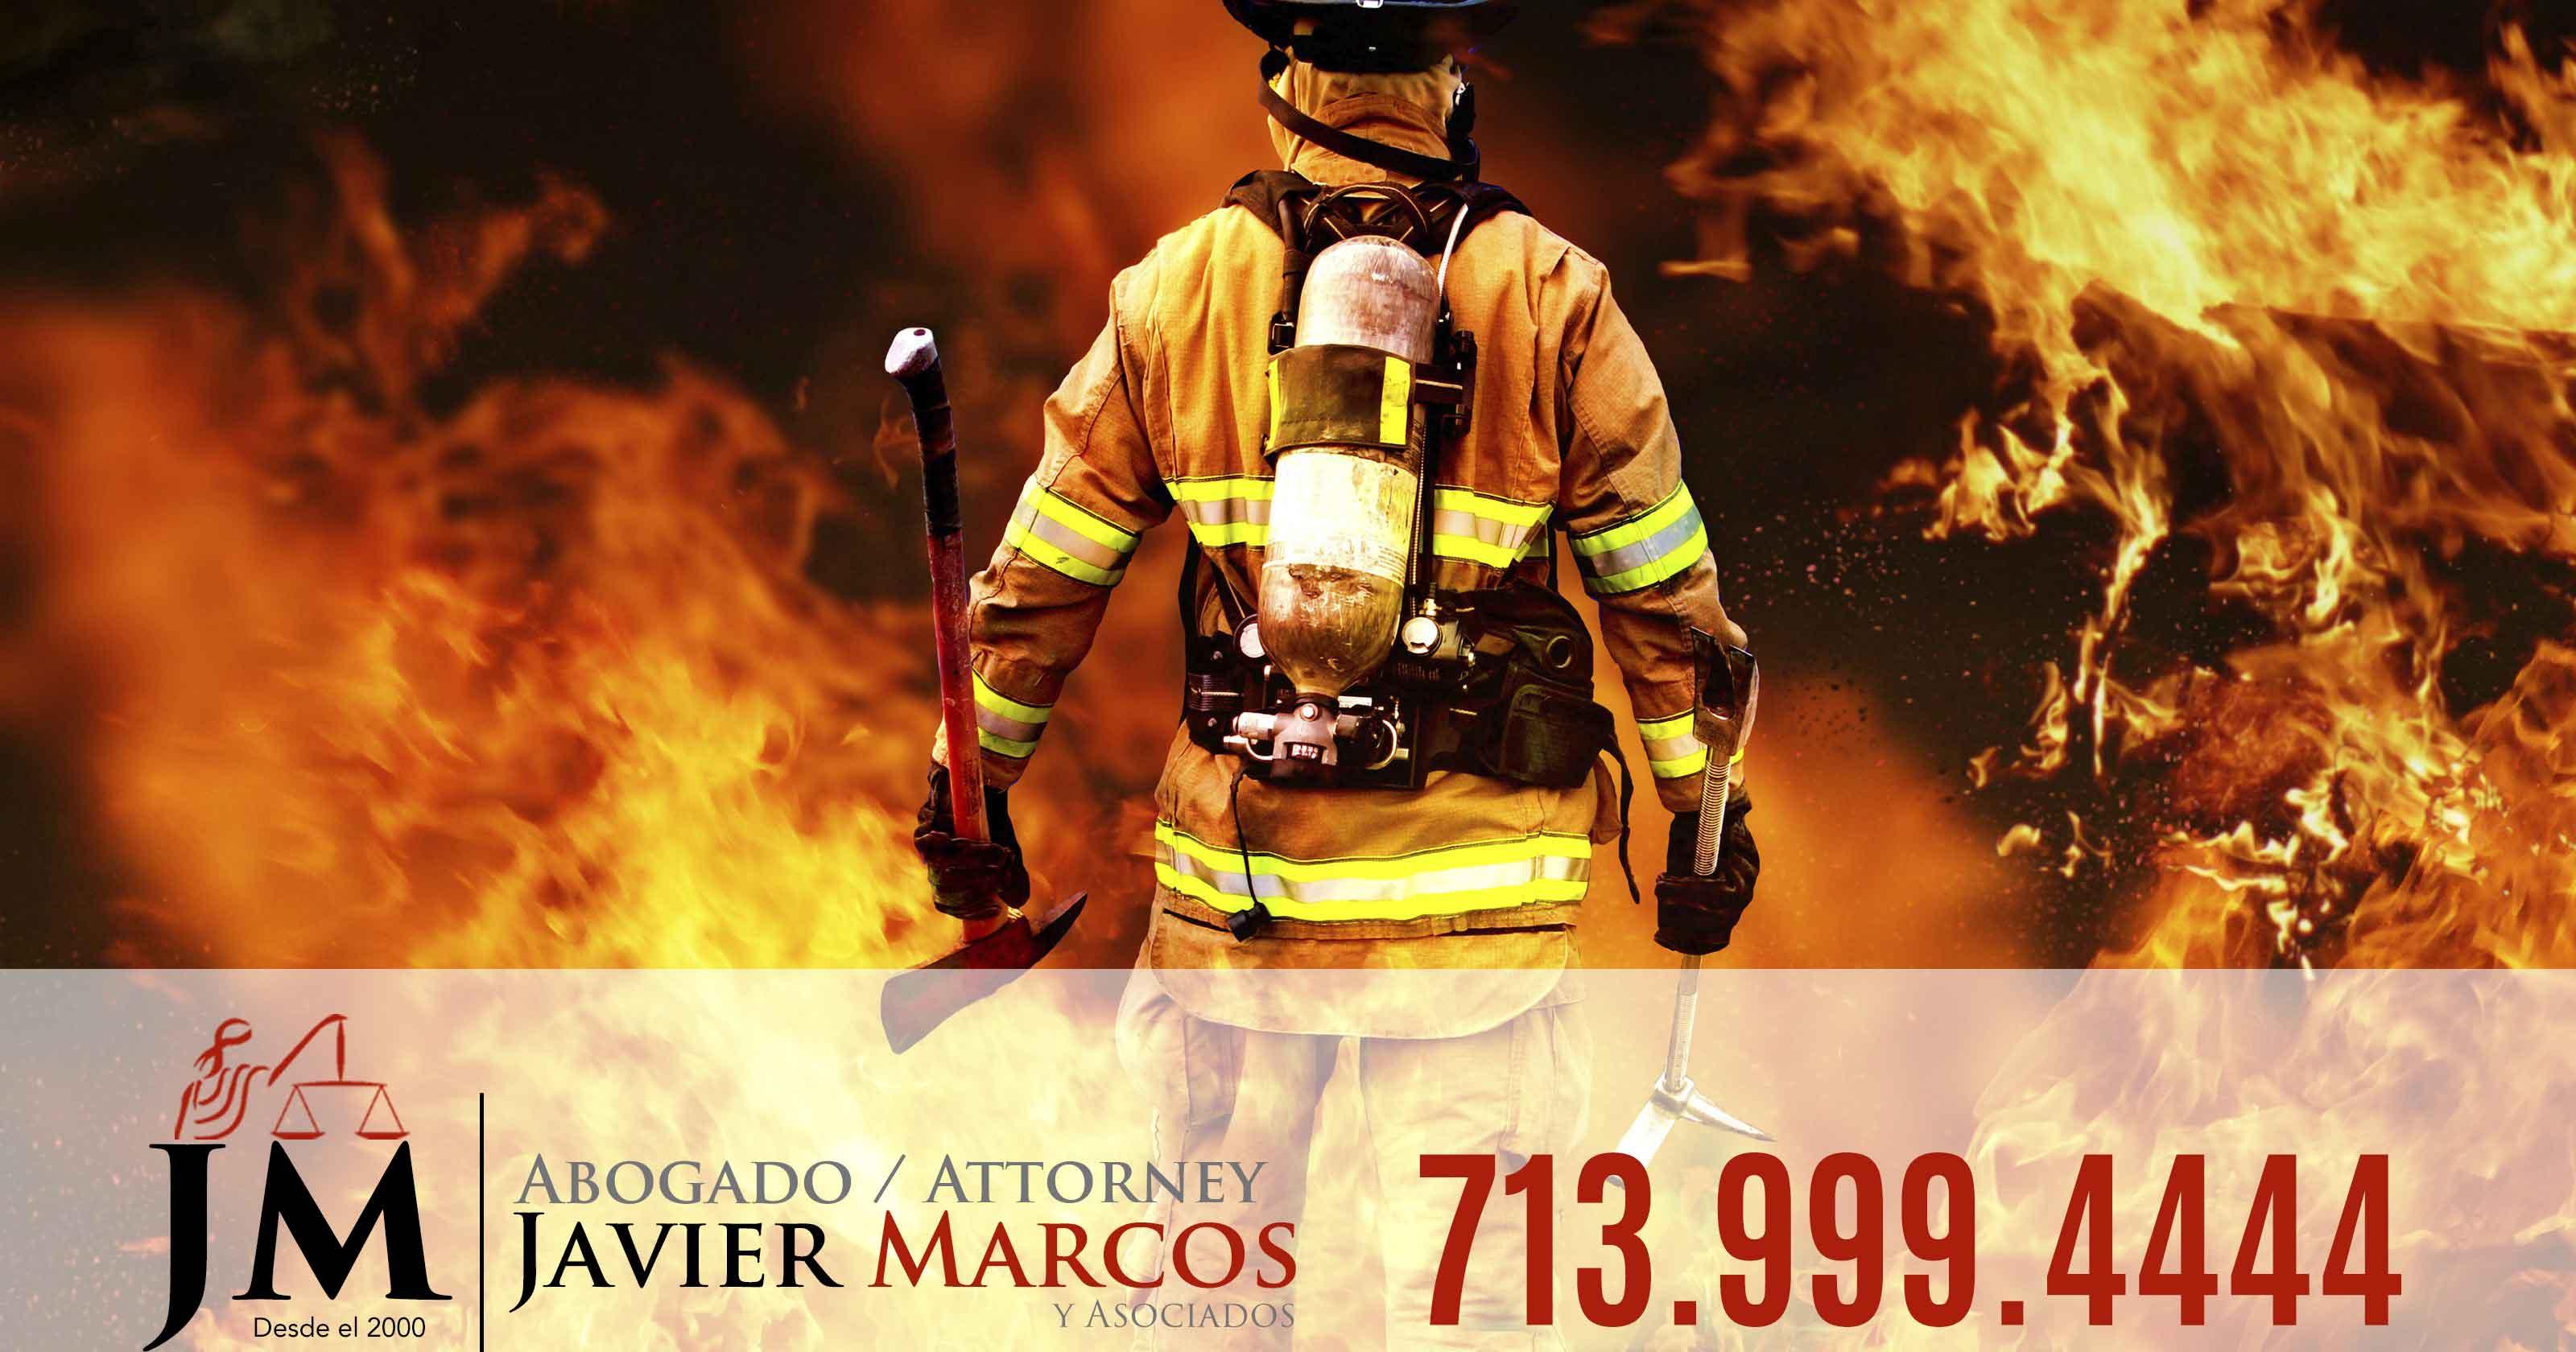 Abogado de Quemaduras | Abogado Javier Marcos | 713.999.4444